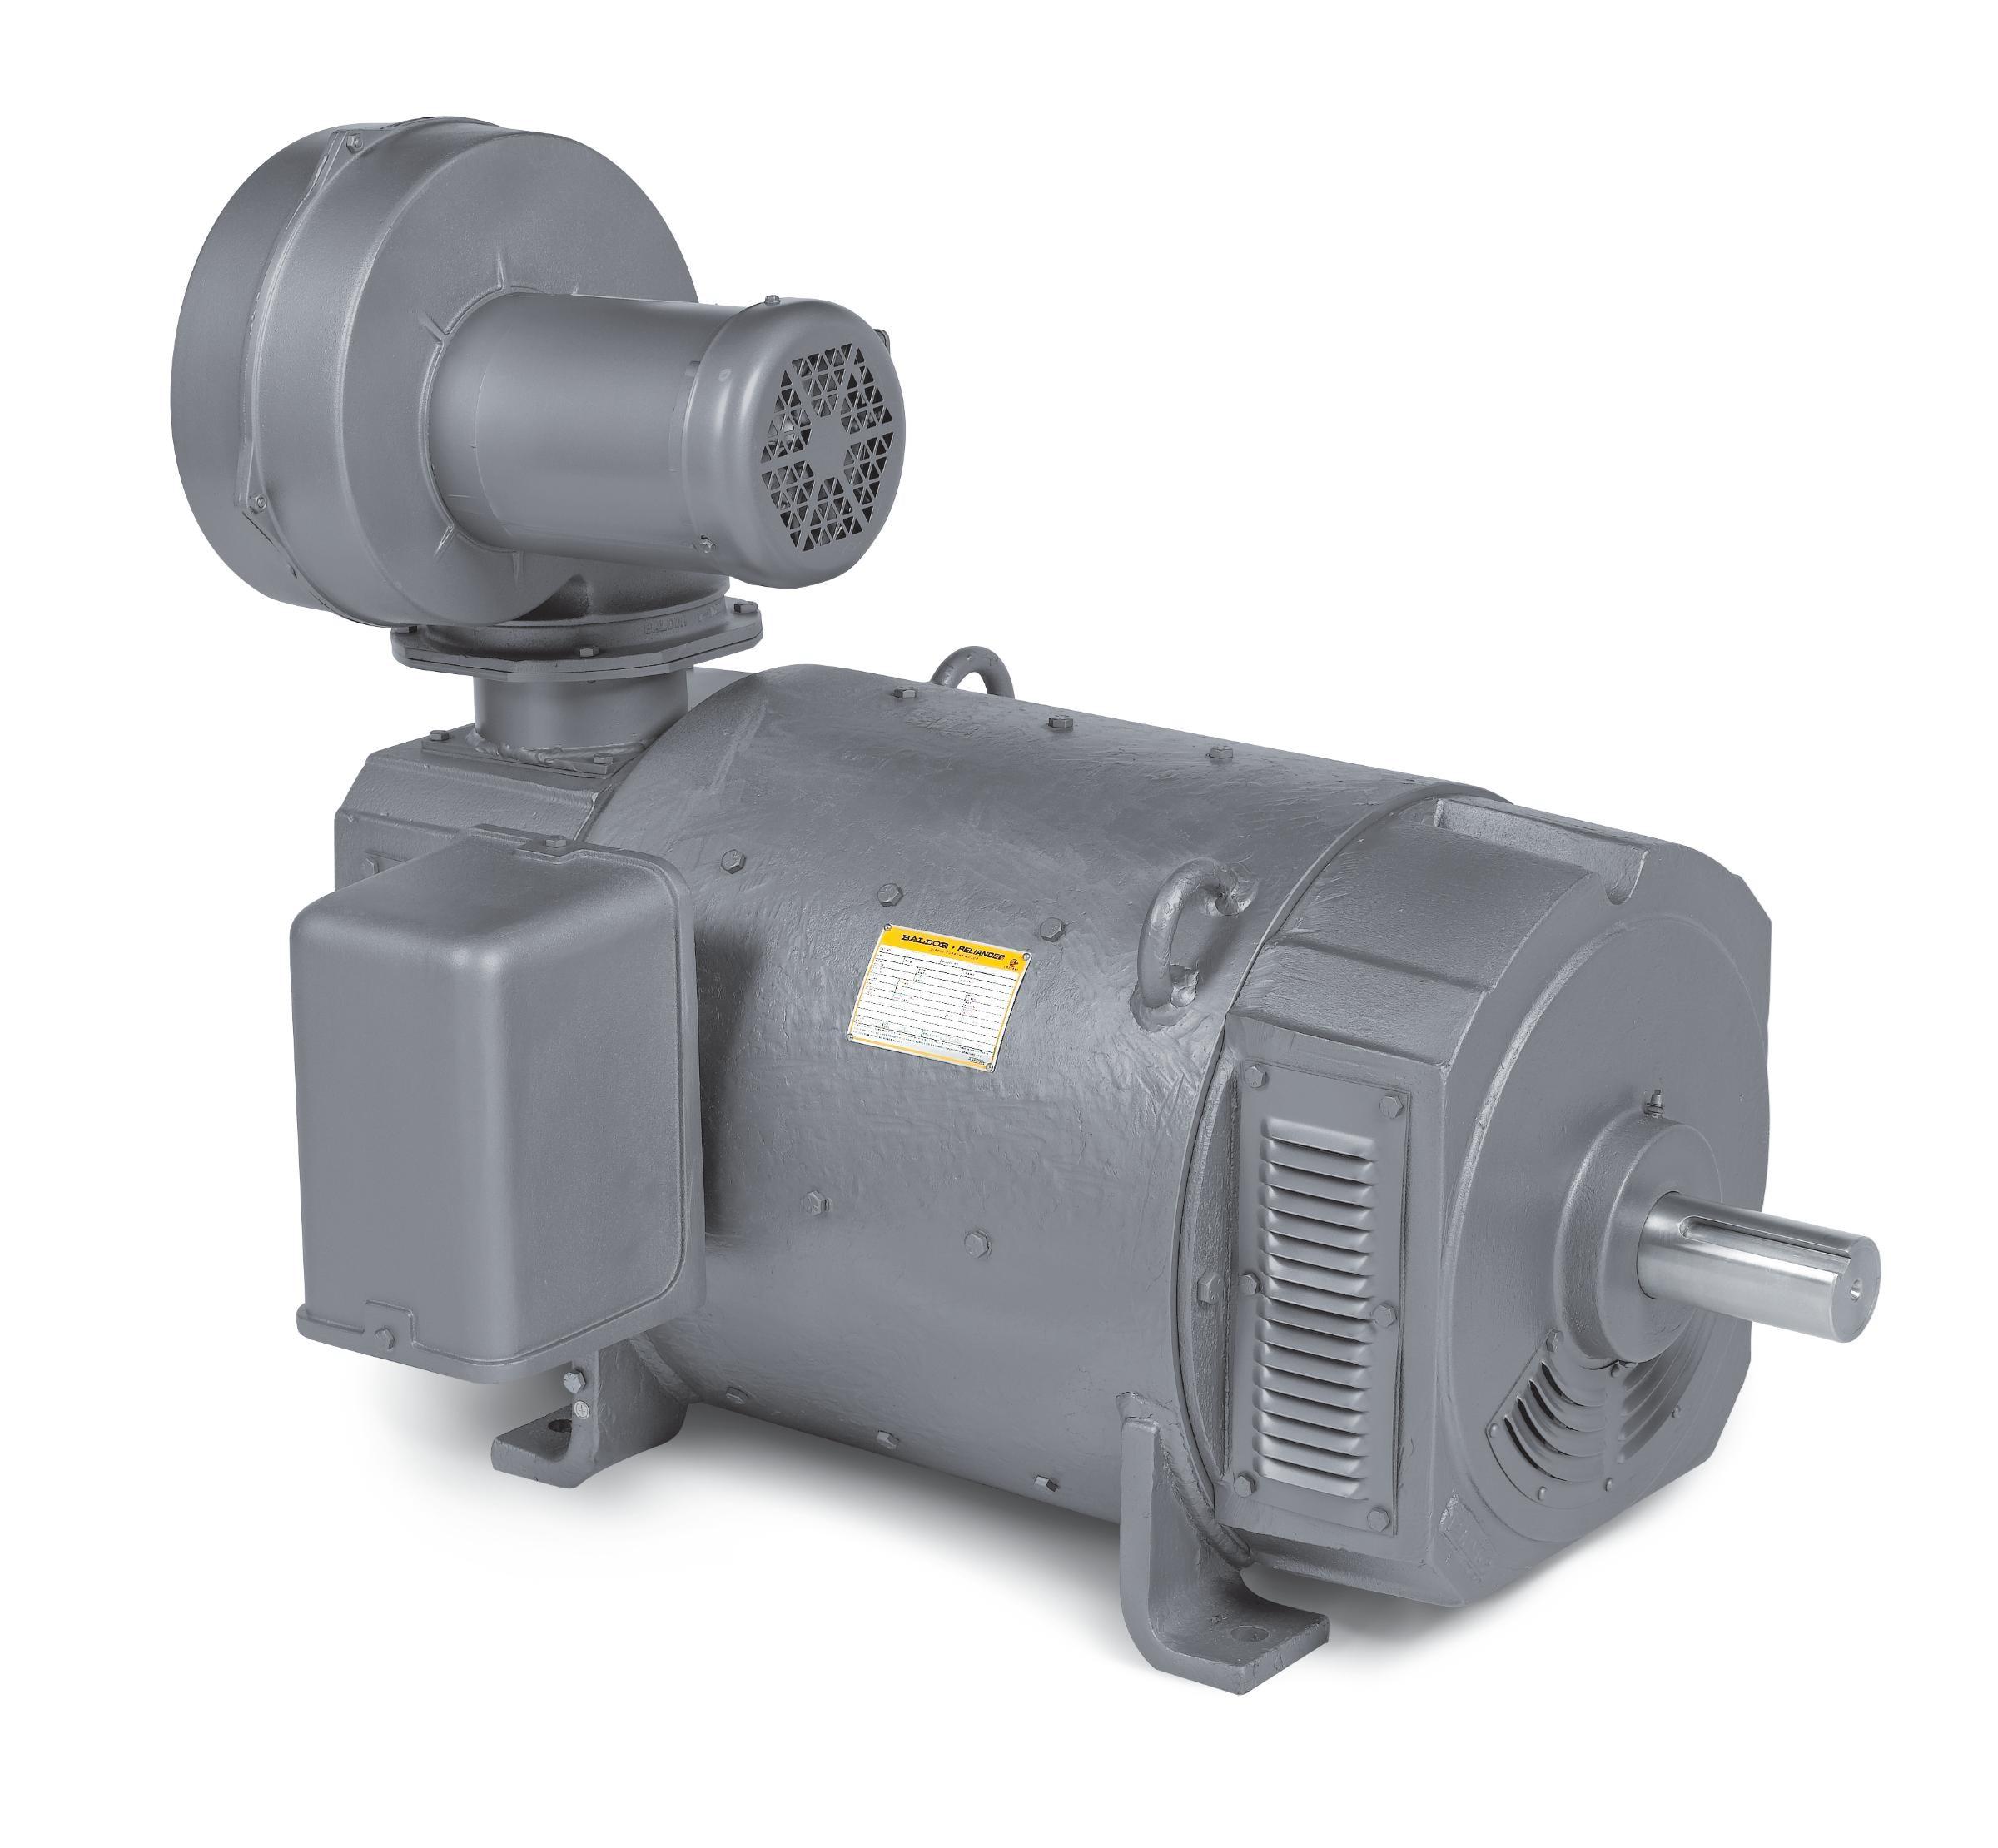 Baldor Industrial Motor Wiring Diagram - Wiring Diagram G9 on